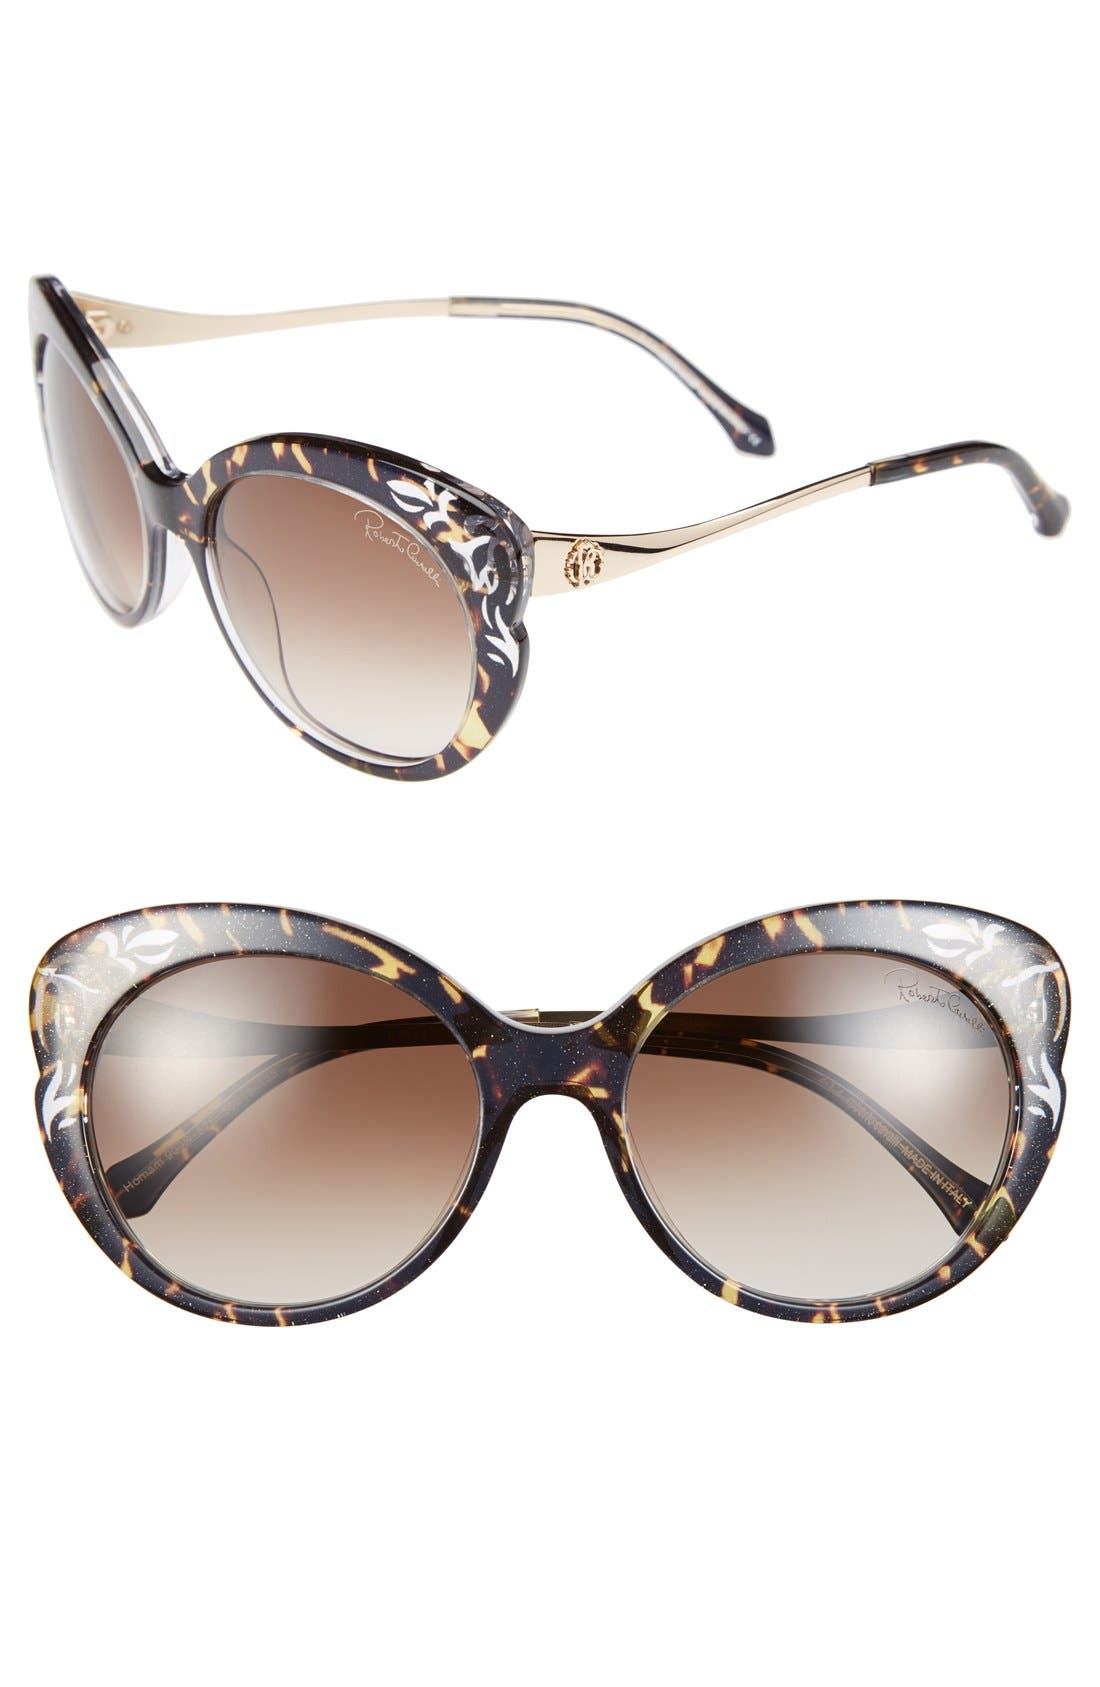 Alternate Image 1 Selected - Roberto Cavalli 'Homam' 55mm Sunglasses